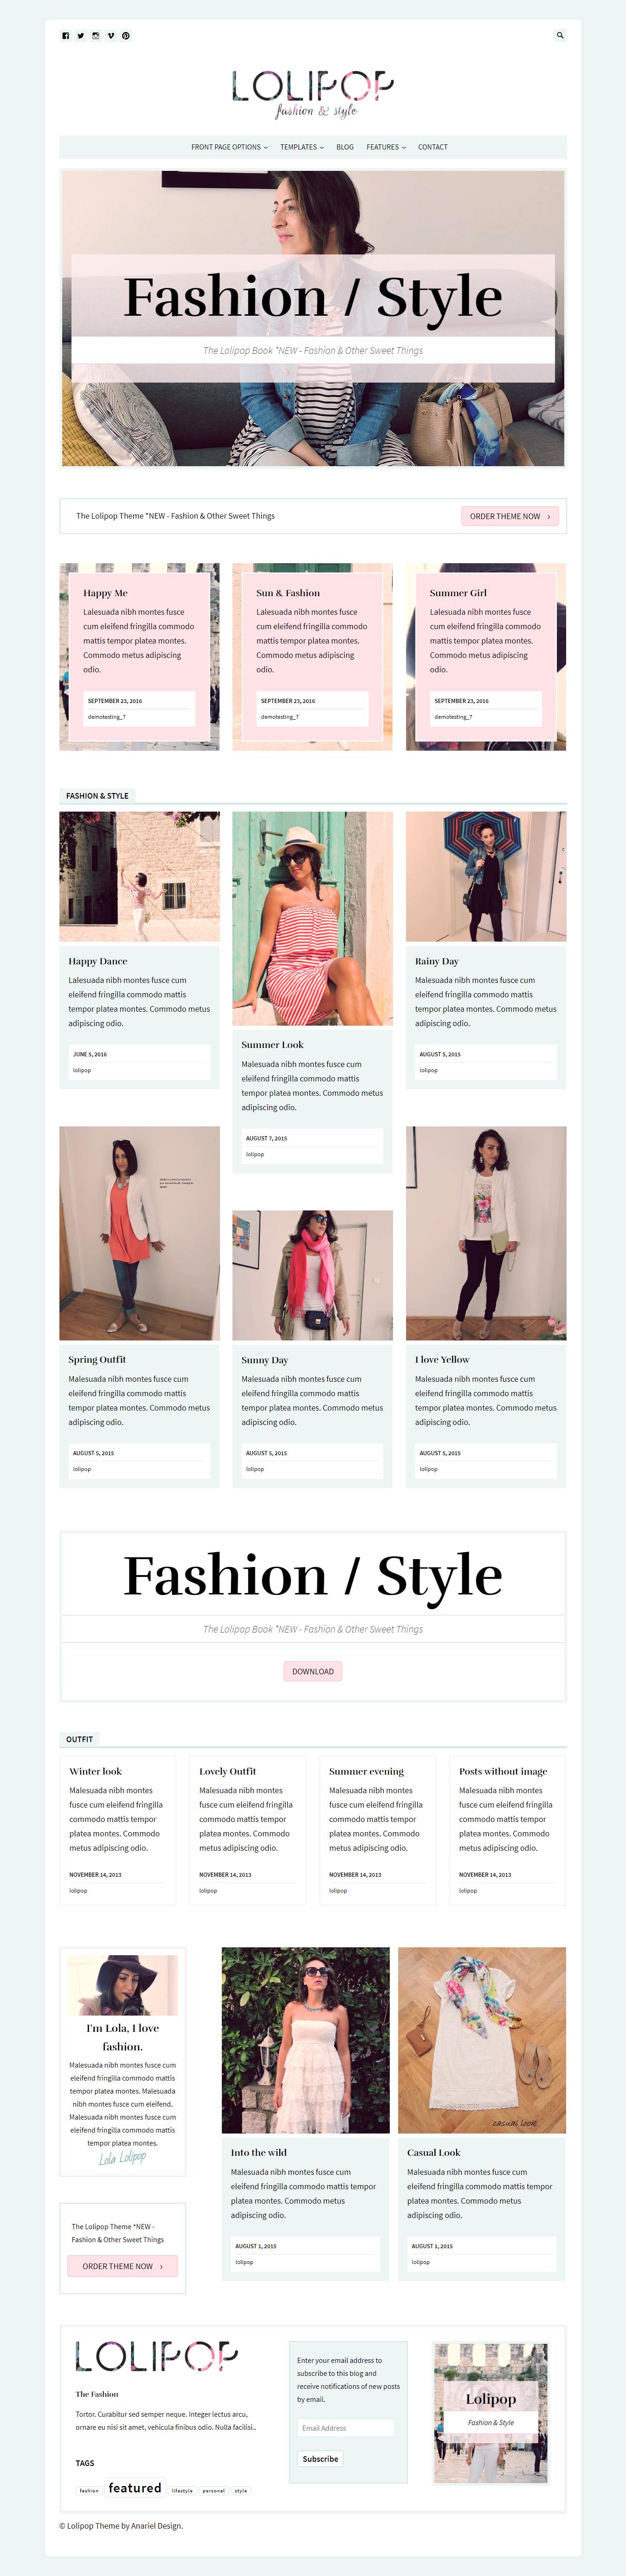 Lolipop - Best Premium Fashion WordPress Themes